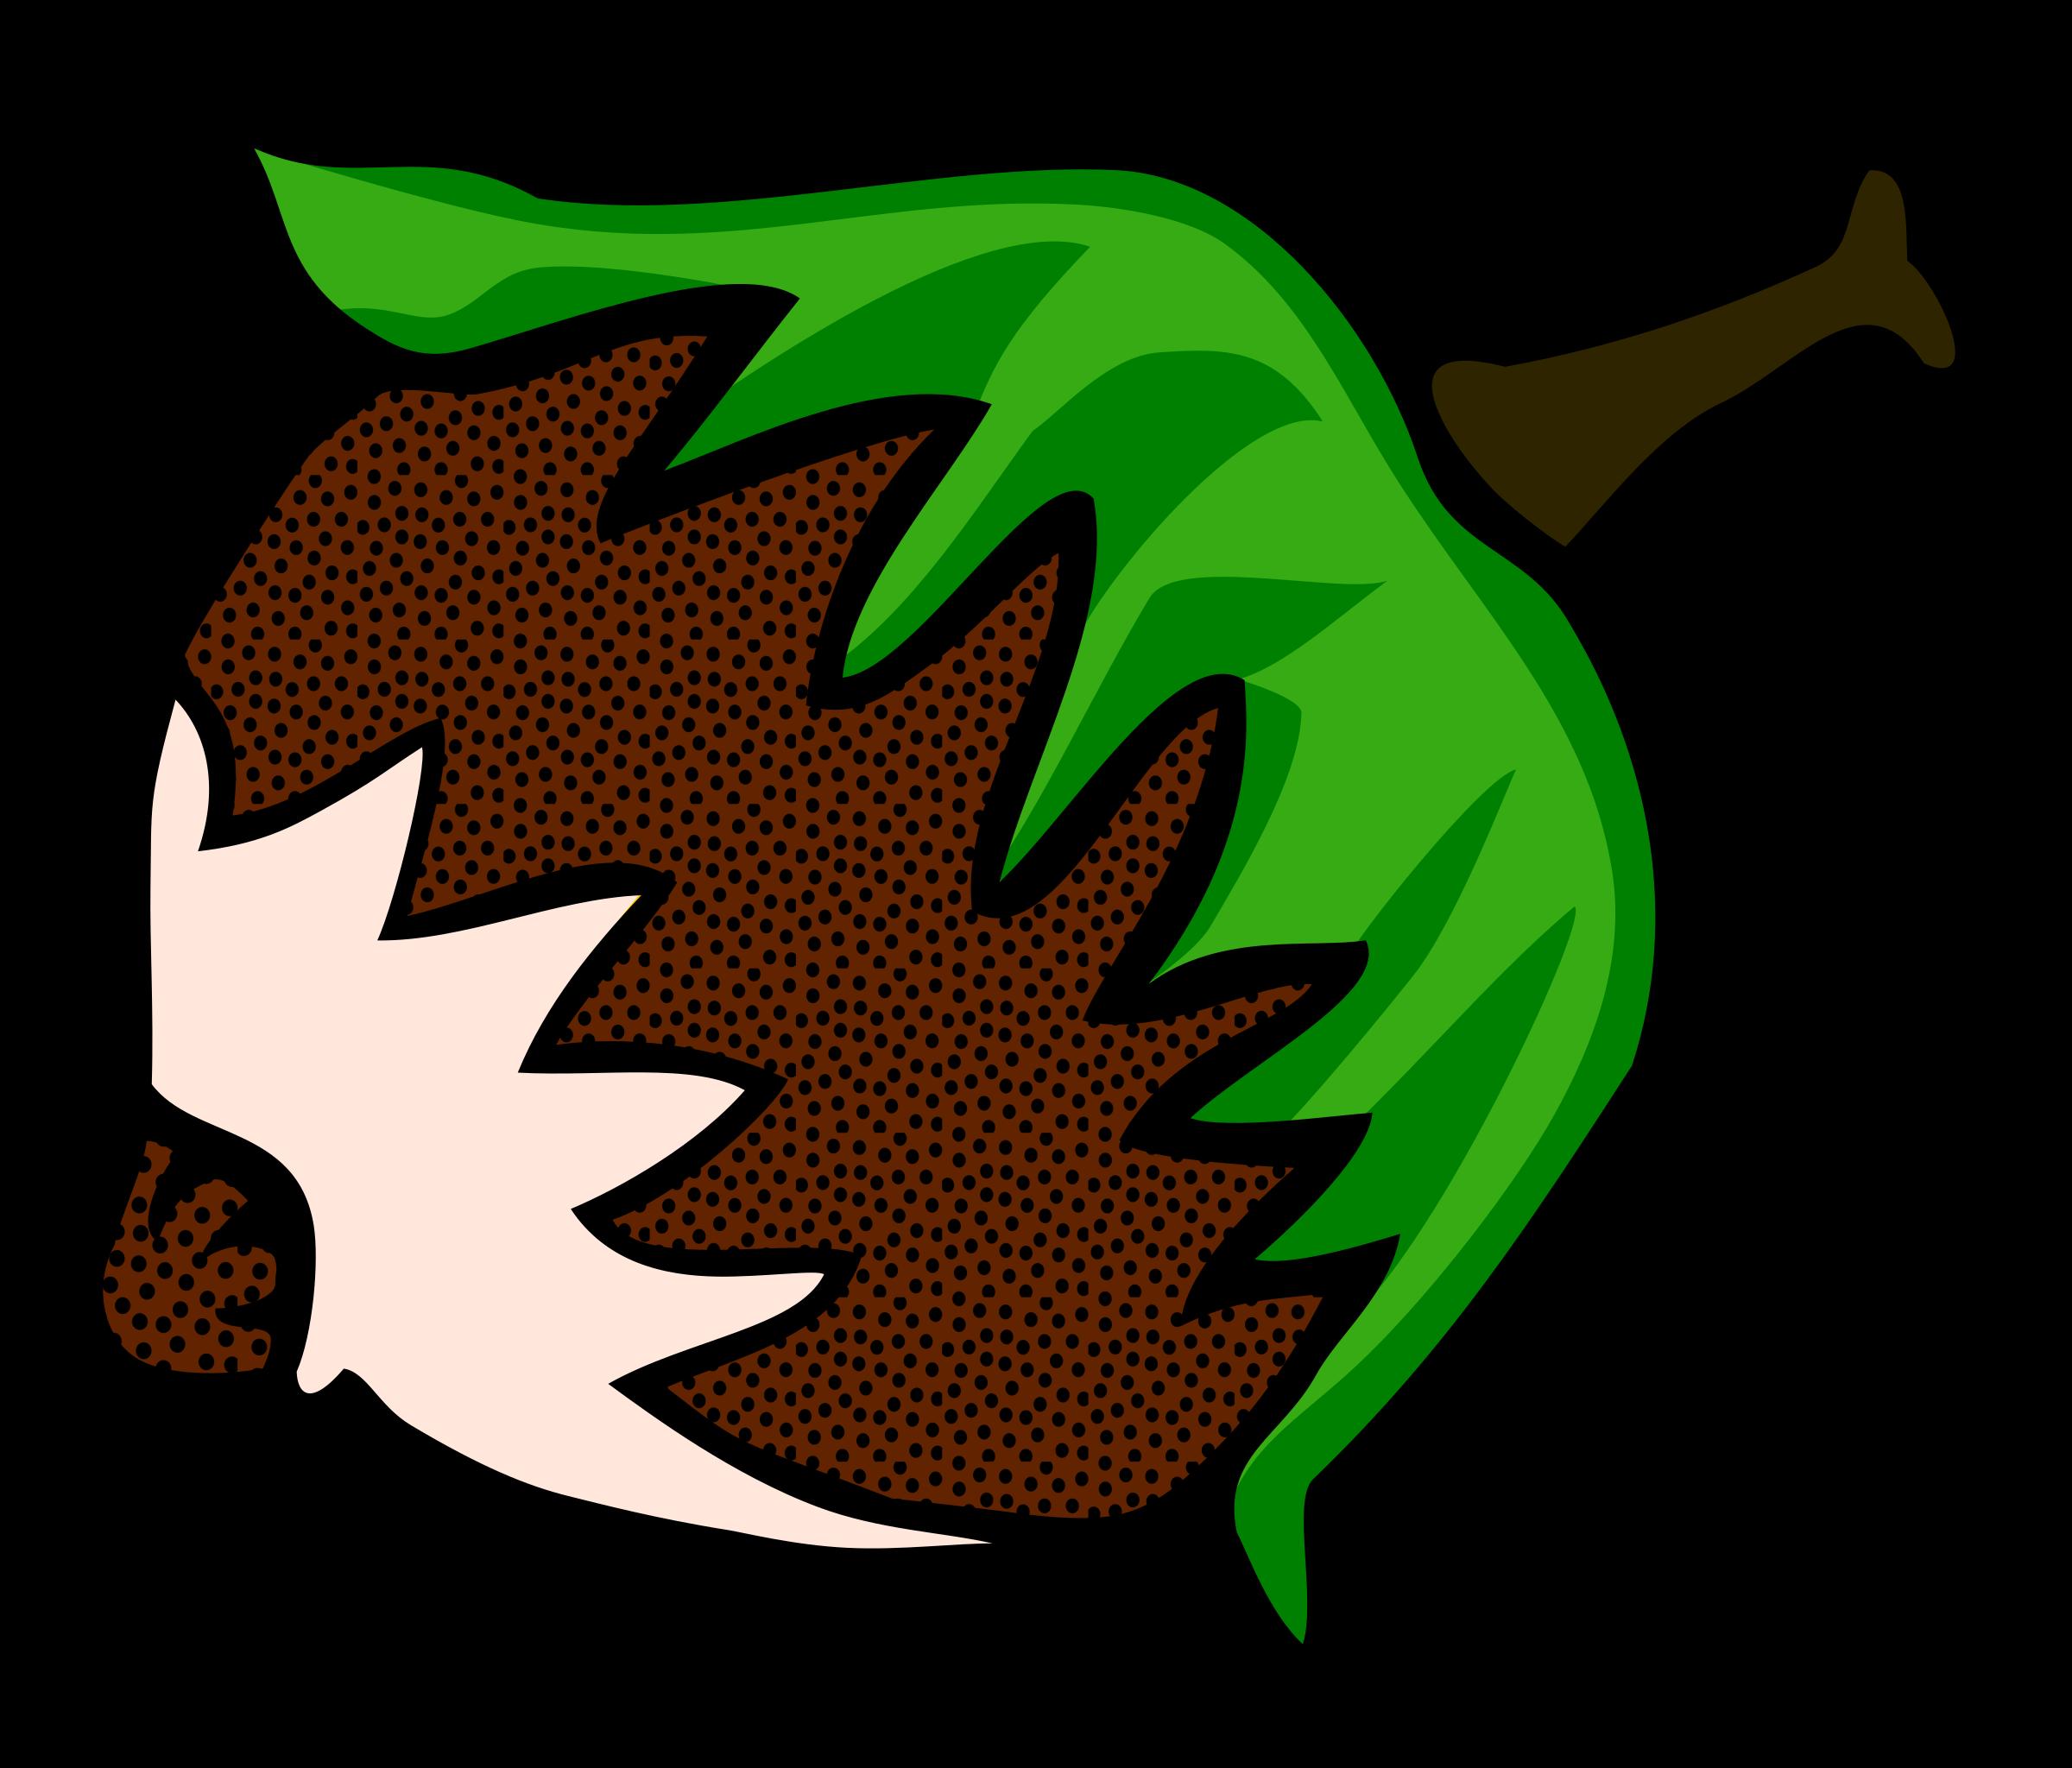 Nut clipart state oregon. Hazelnut group coloured